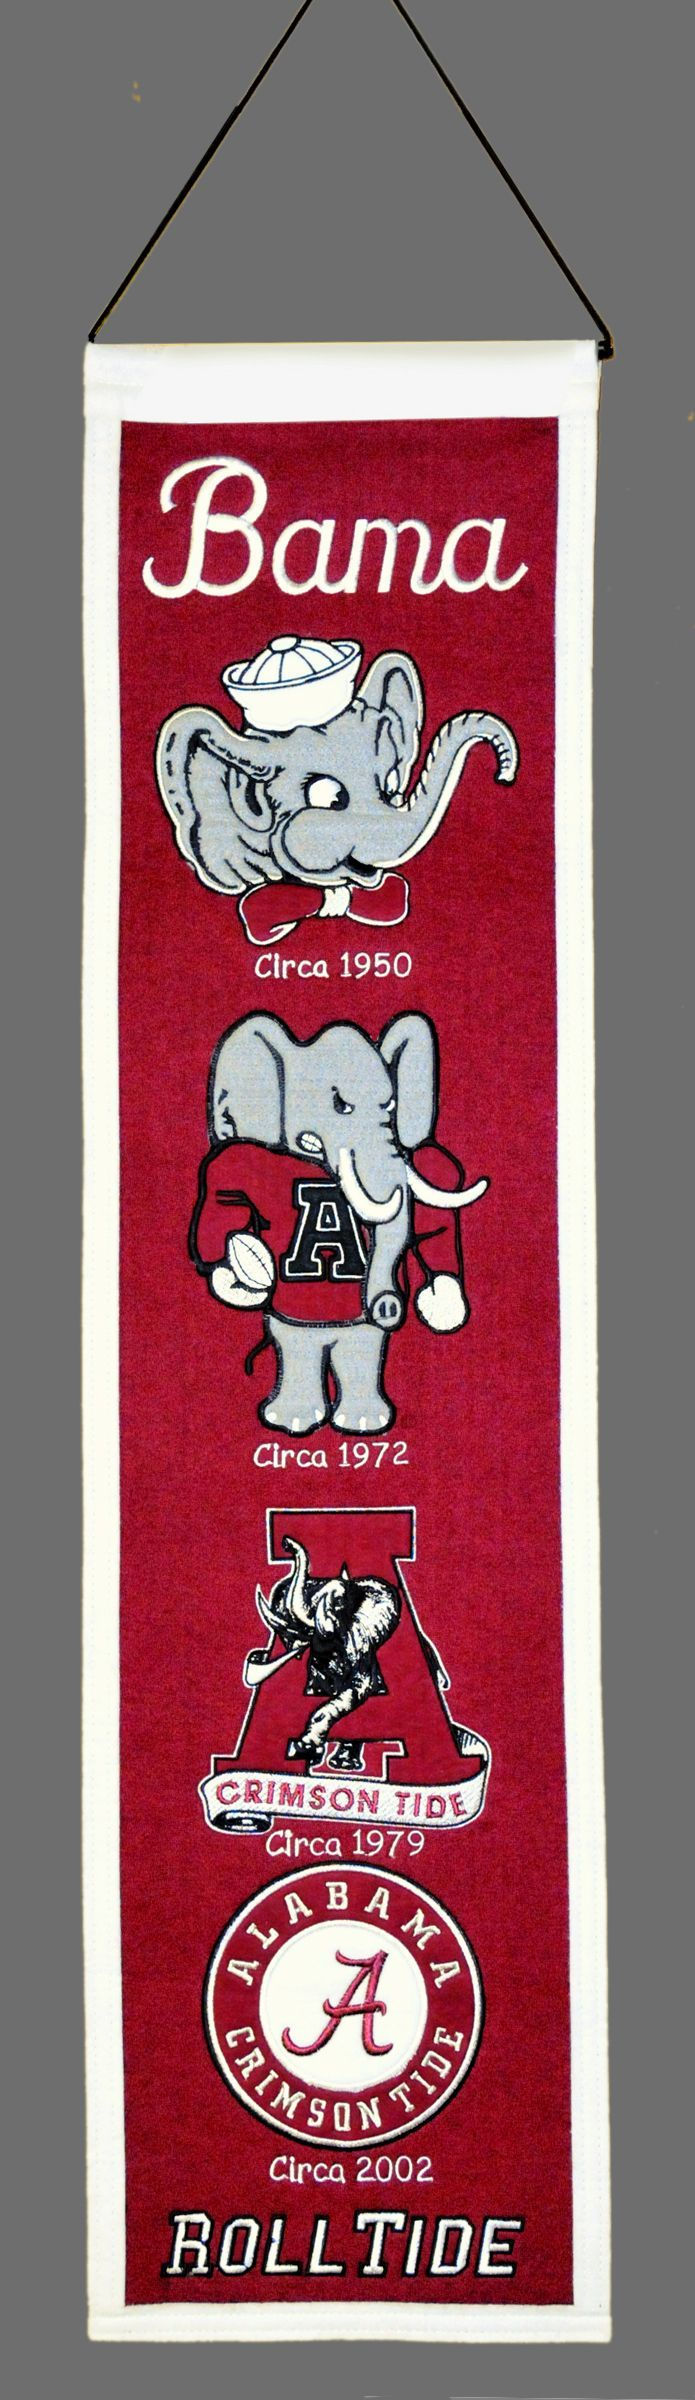 Alabama Football Gift Basket | HOME › Heritage Banners